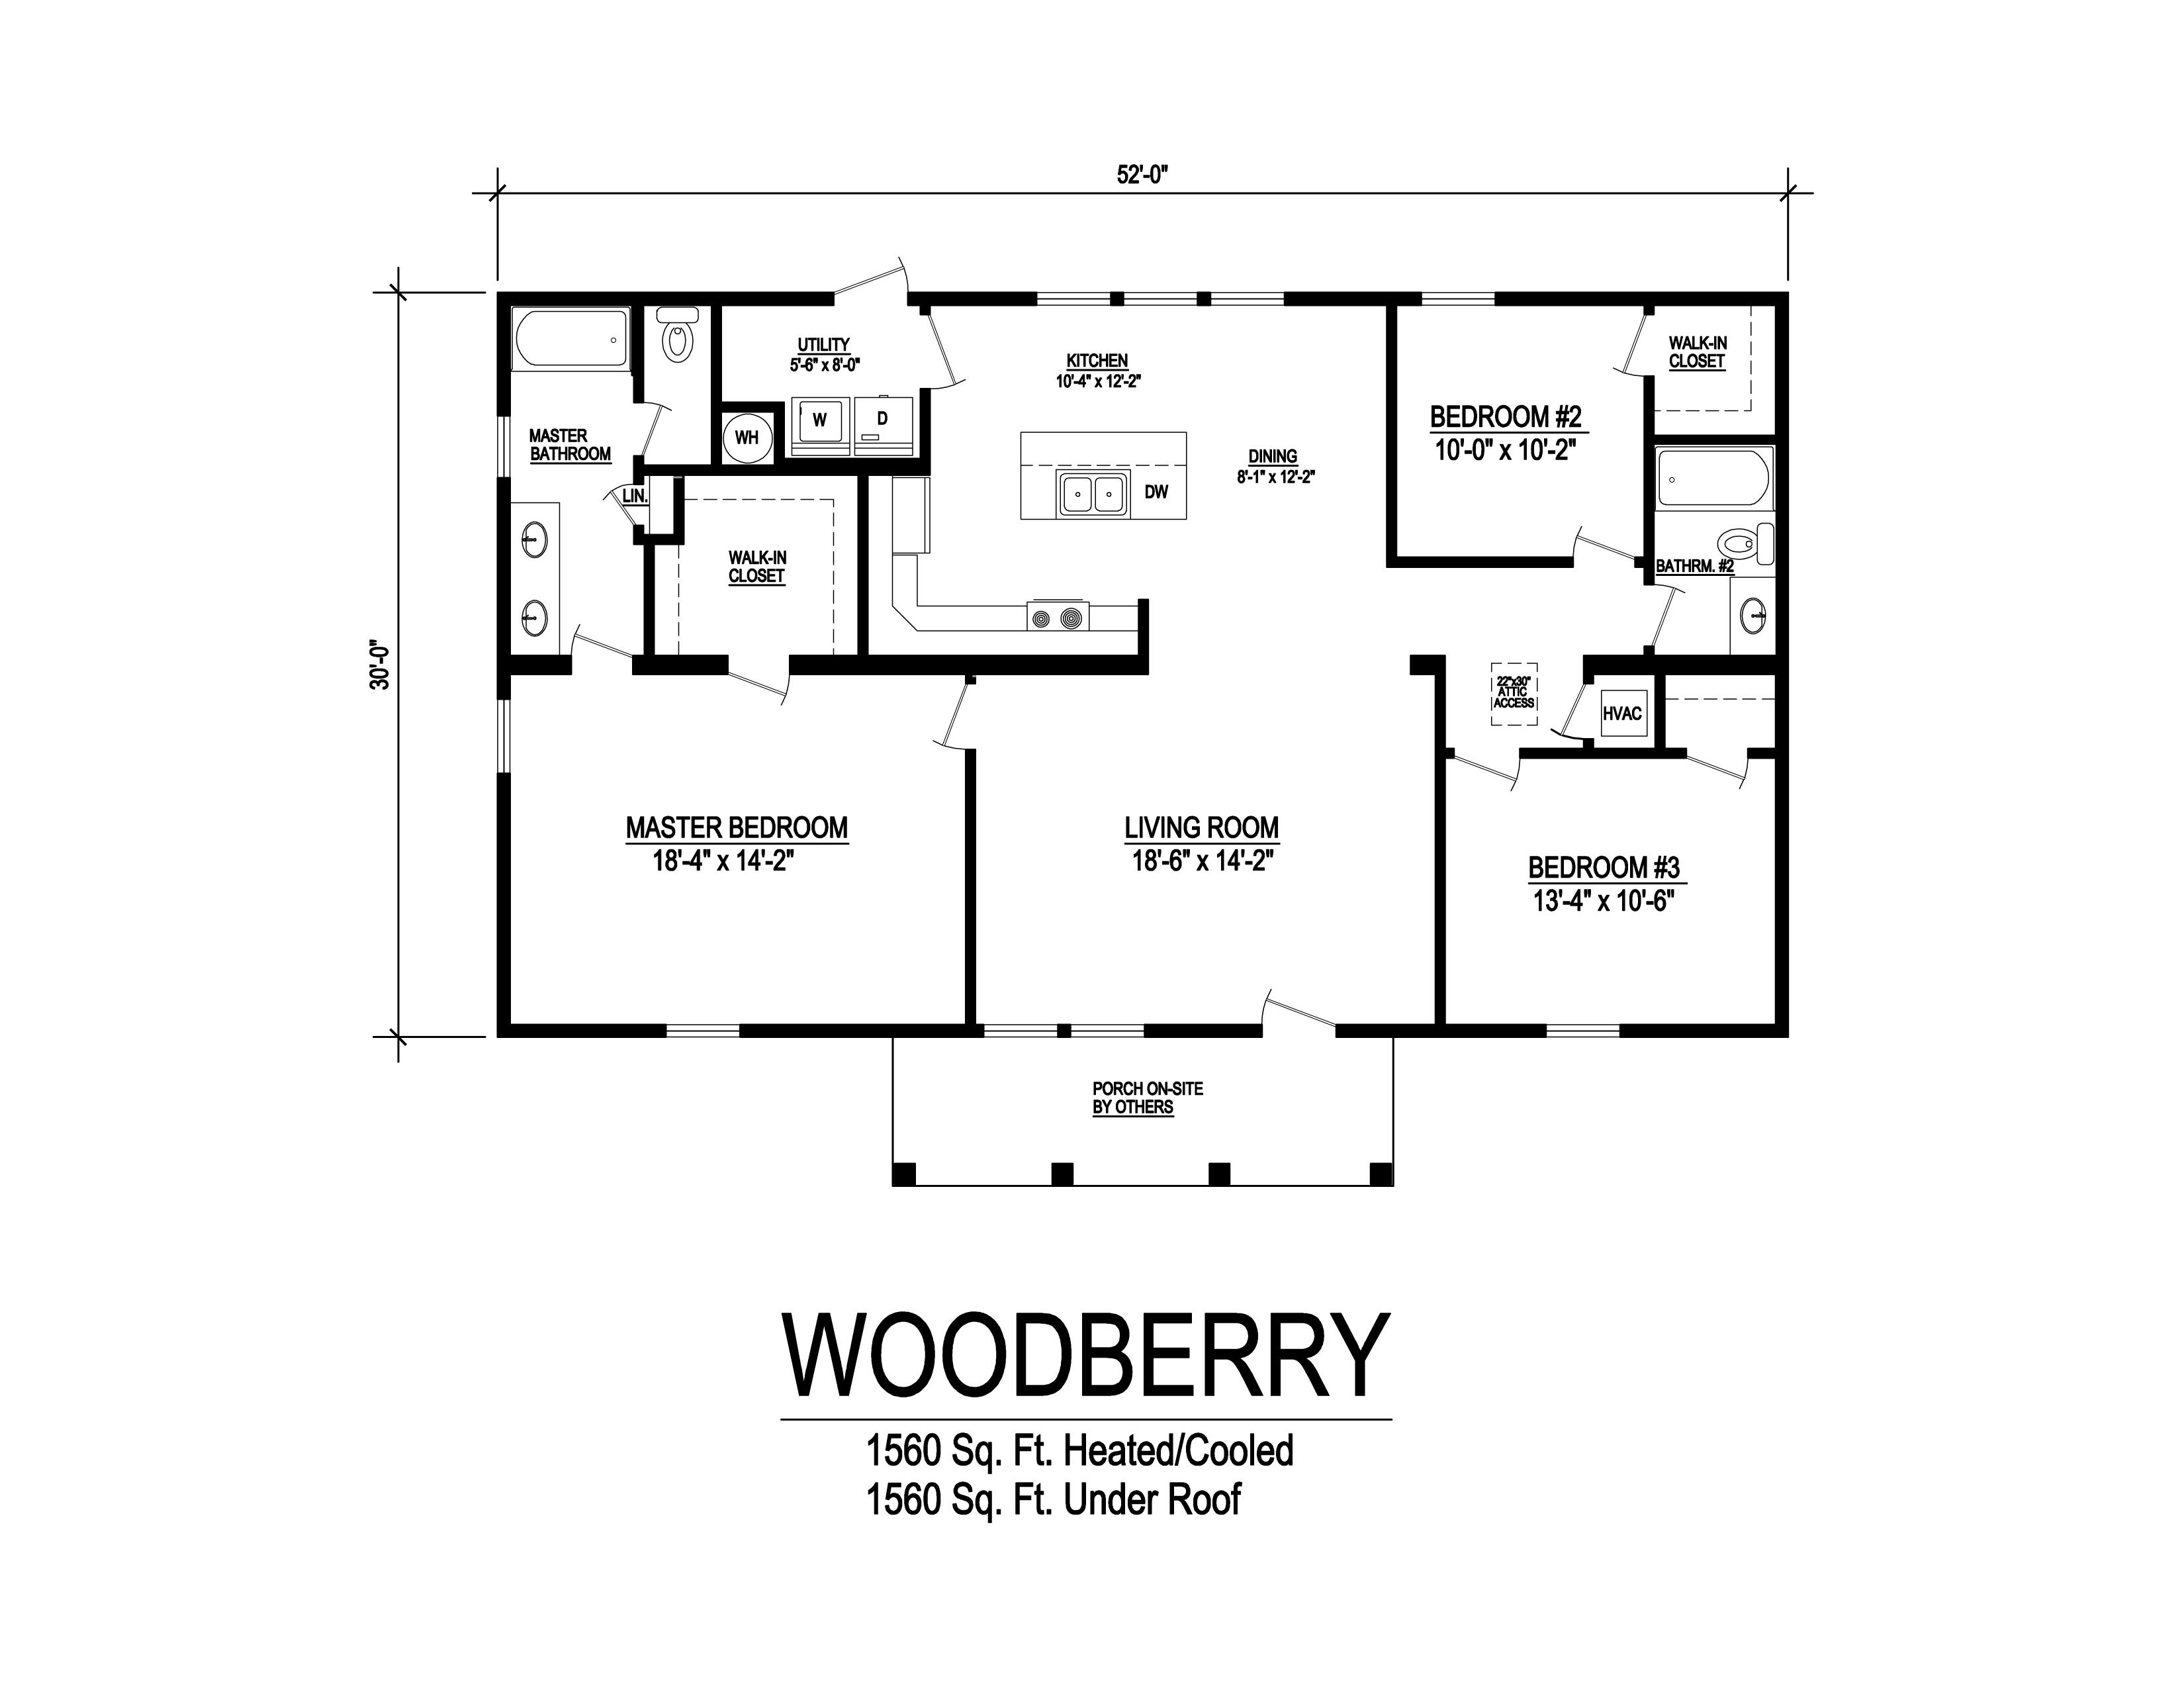 woodberry modular home floorplan